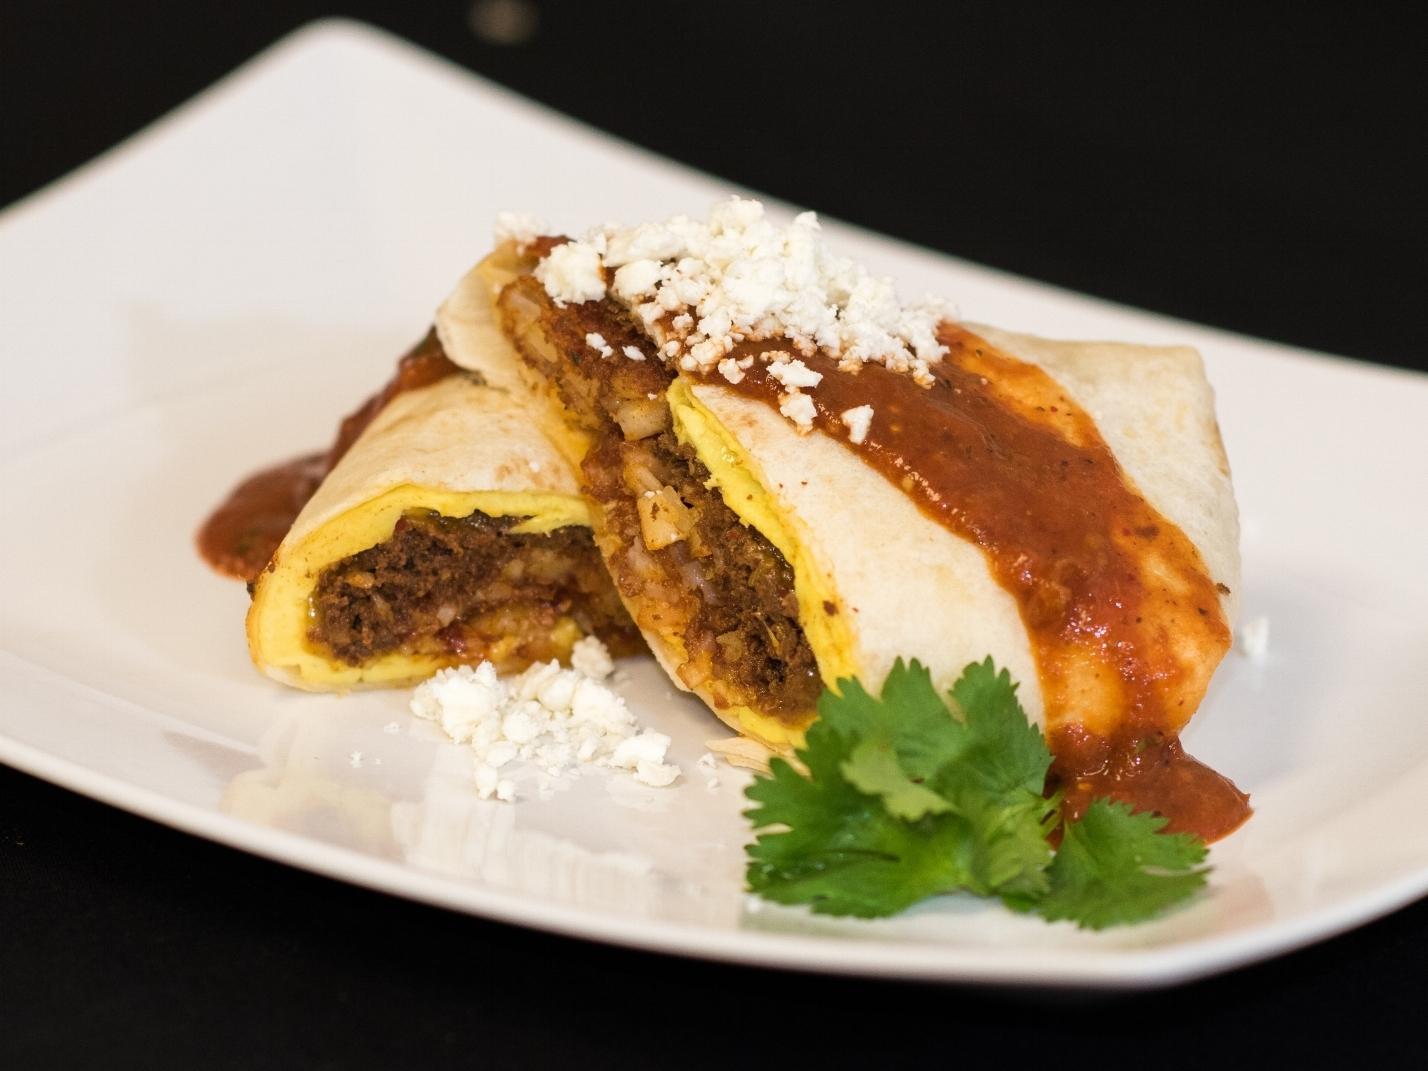 minneapolis-locally-sourced-breakfast-to-go-burrito.jpg